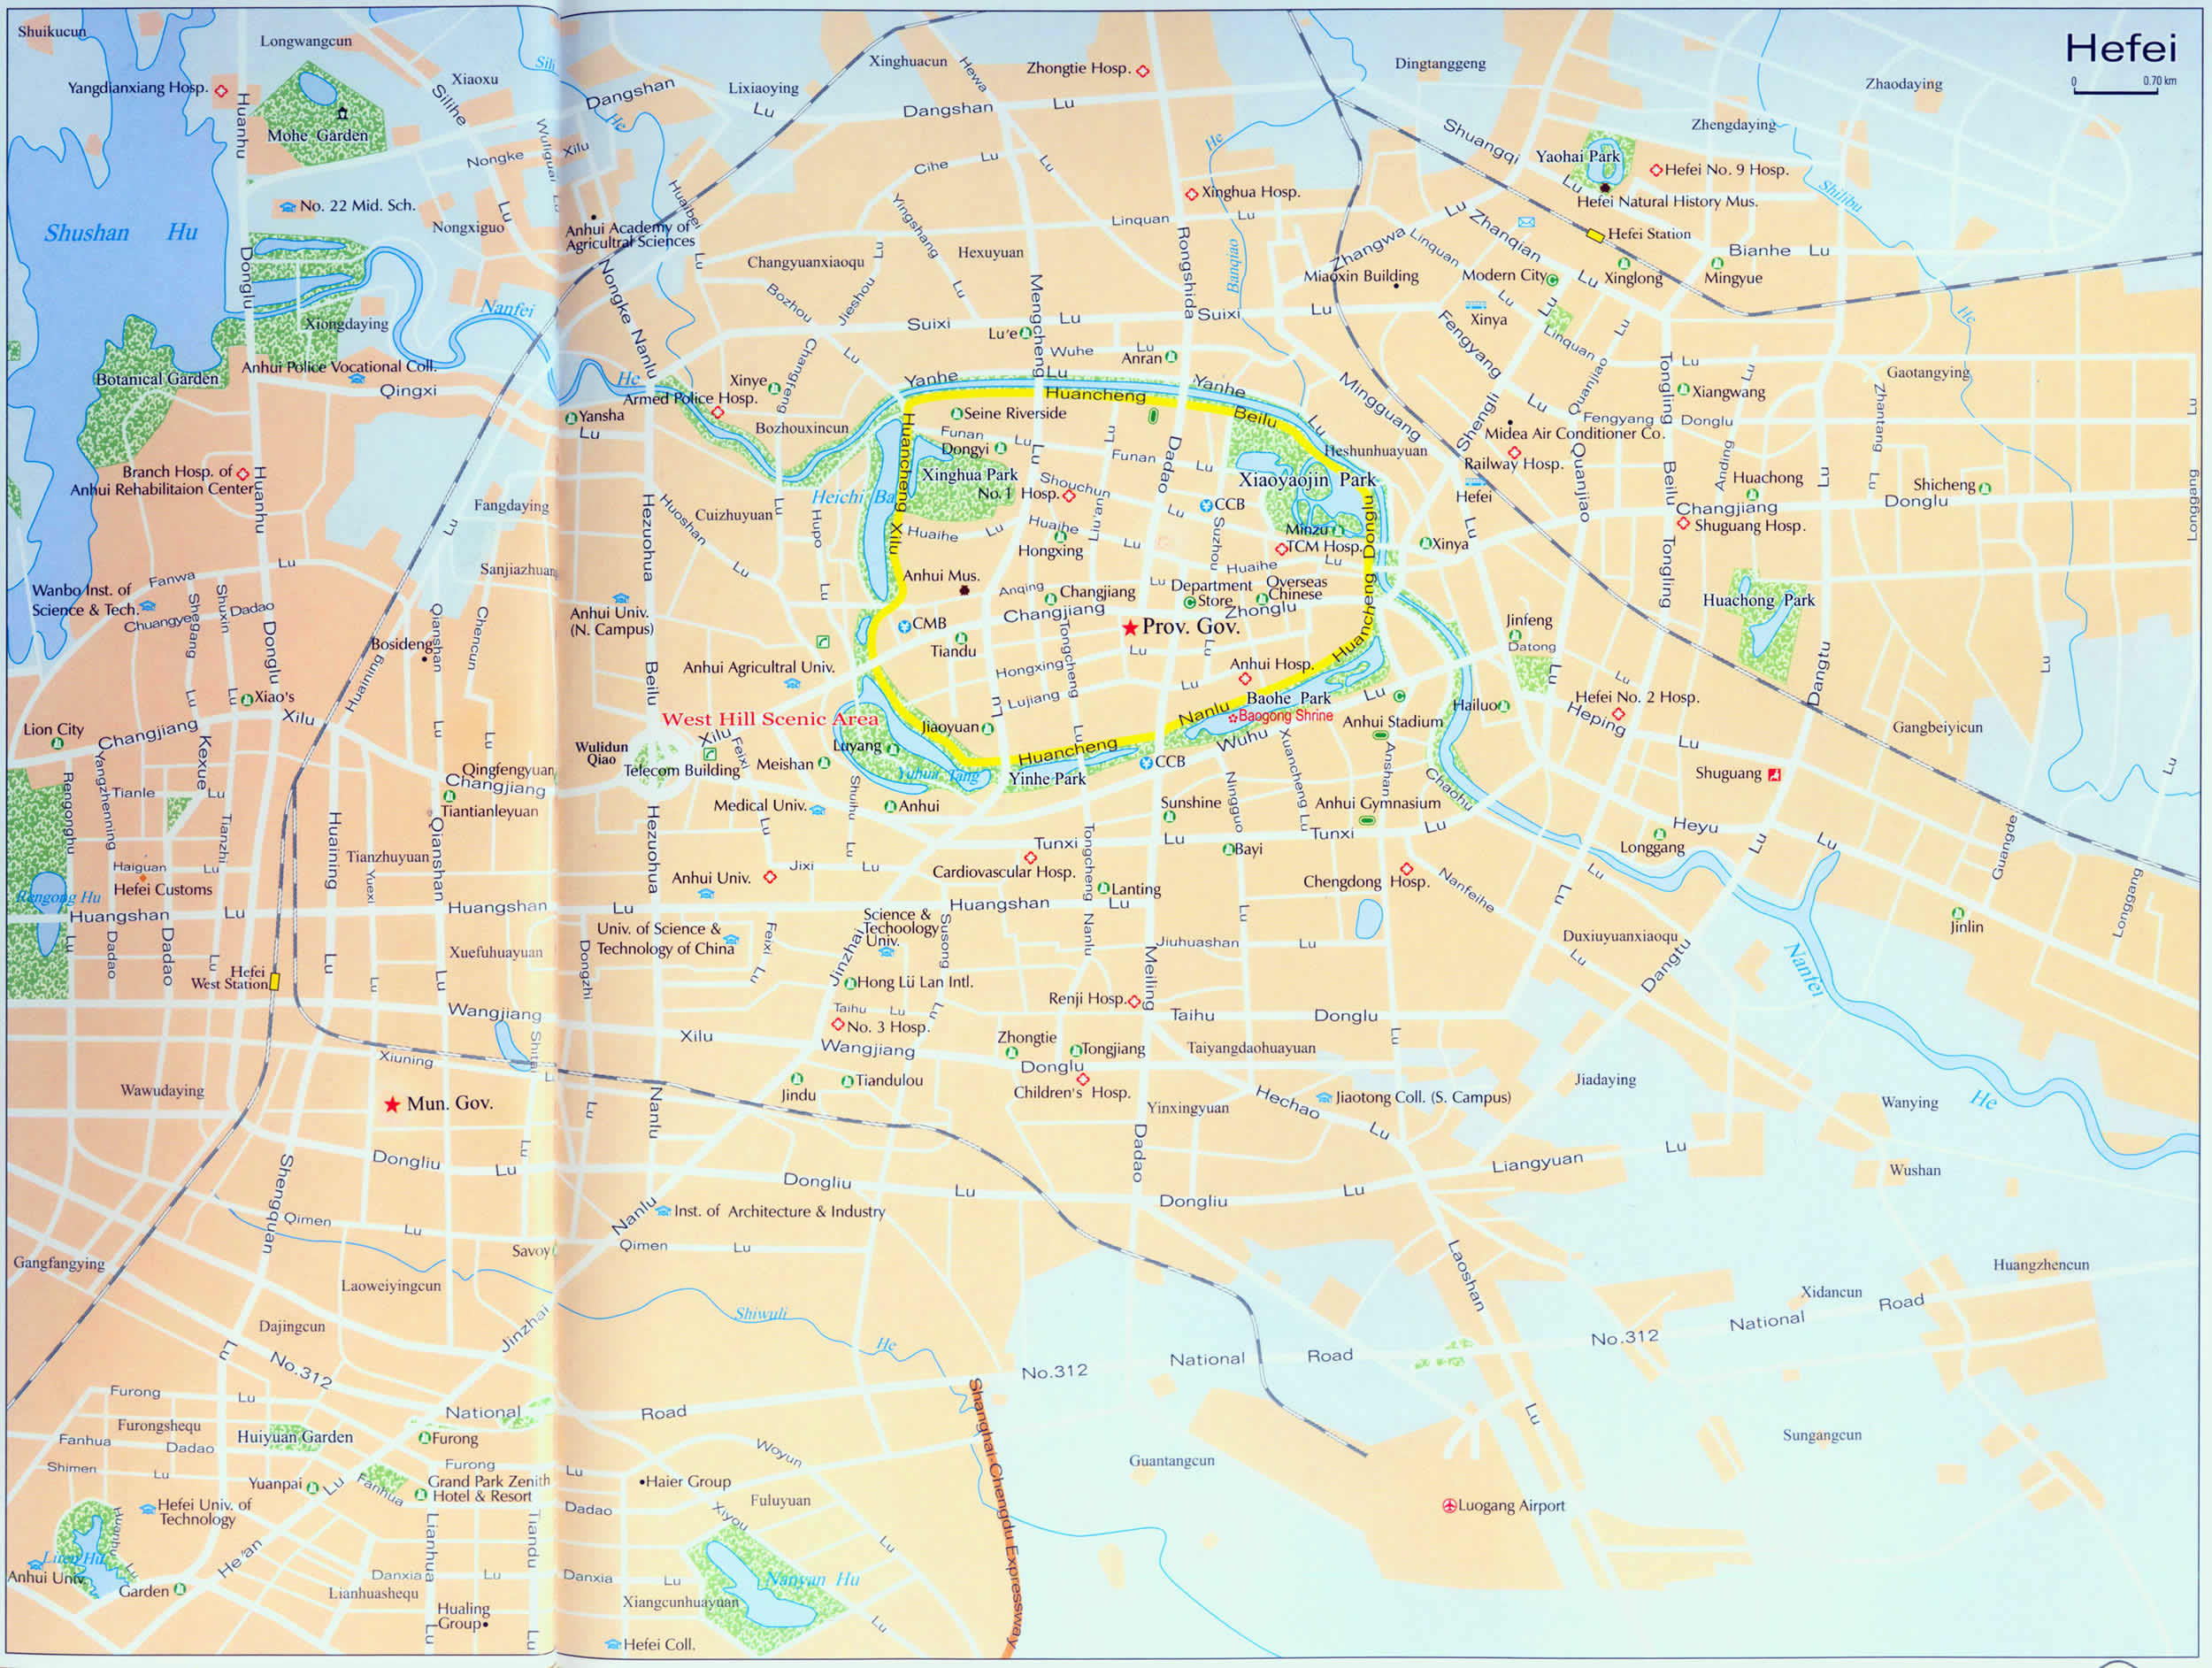 Hefei Tourist Map